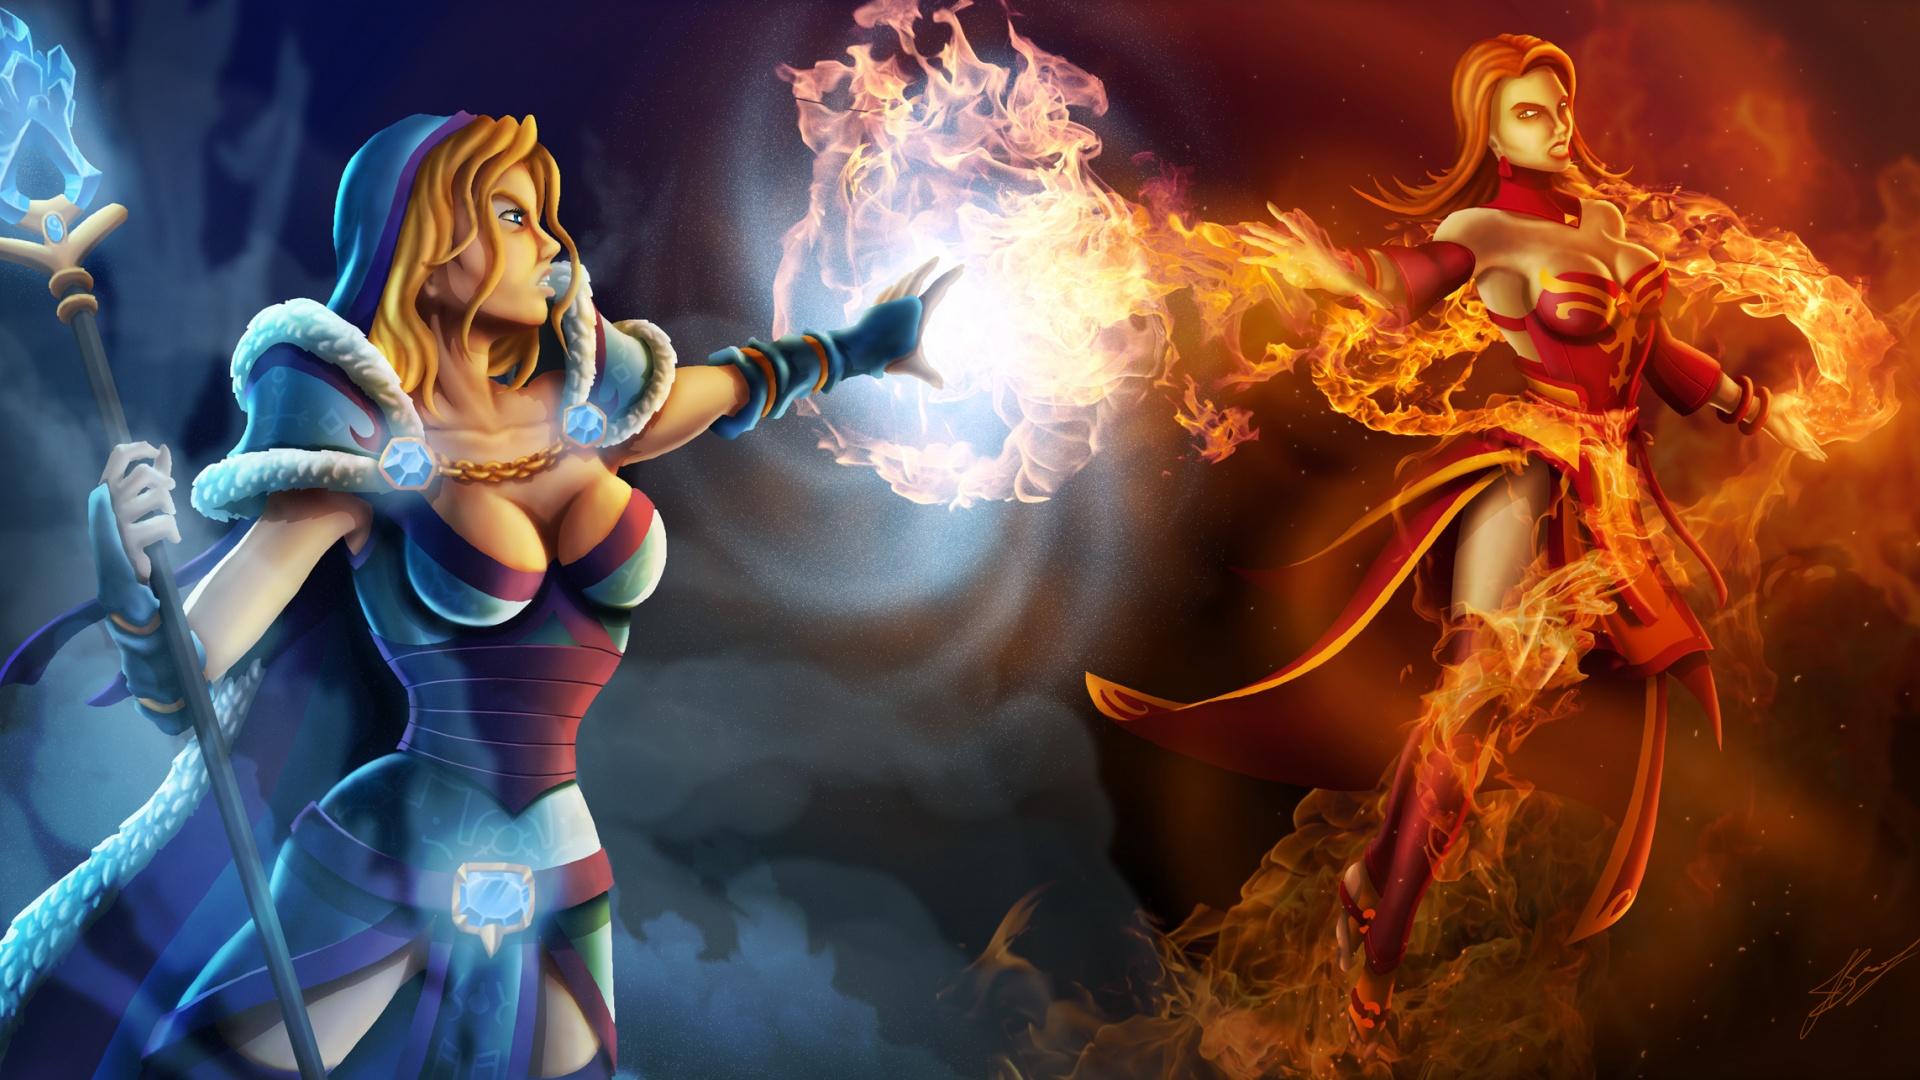 Download Dota 2 Crystal Maiden vs Lina Artwork Wallpaper in 1920x1080 1920x1080